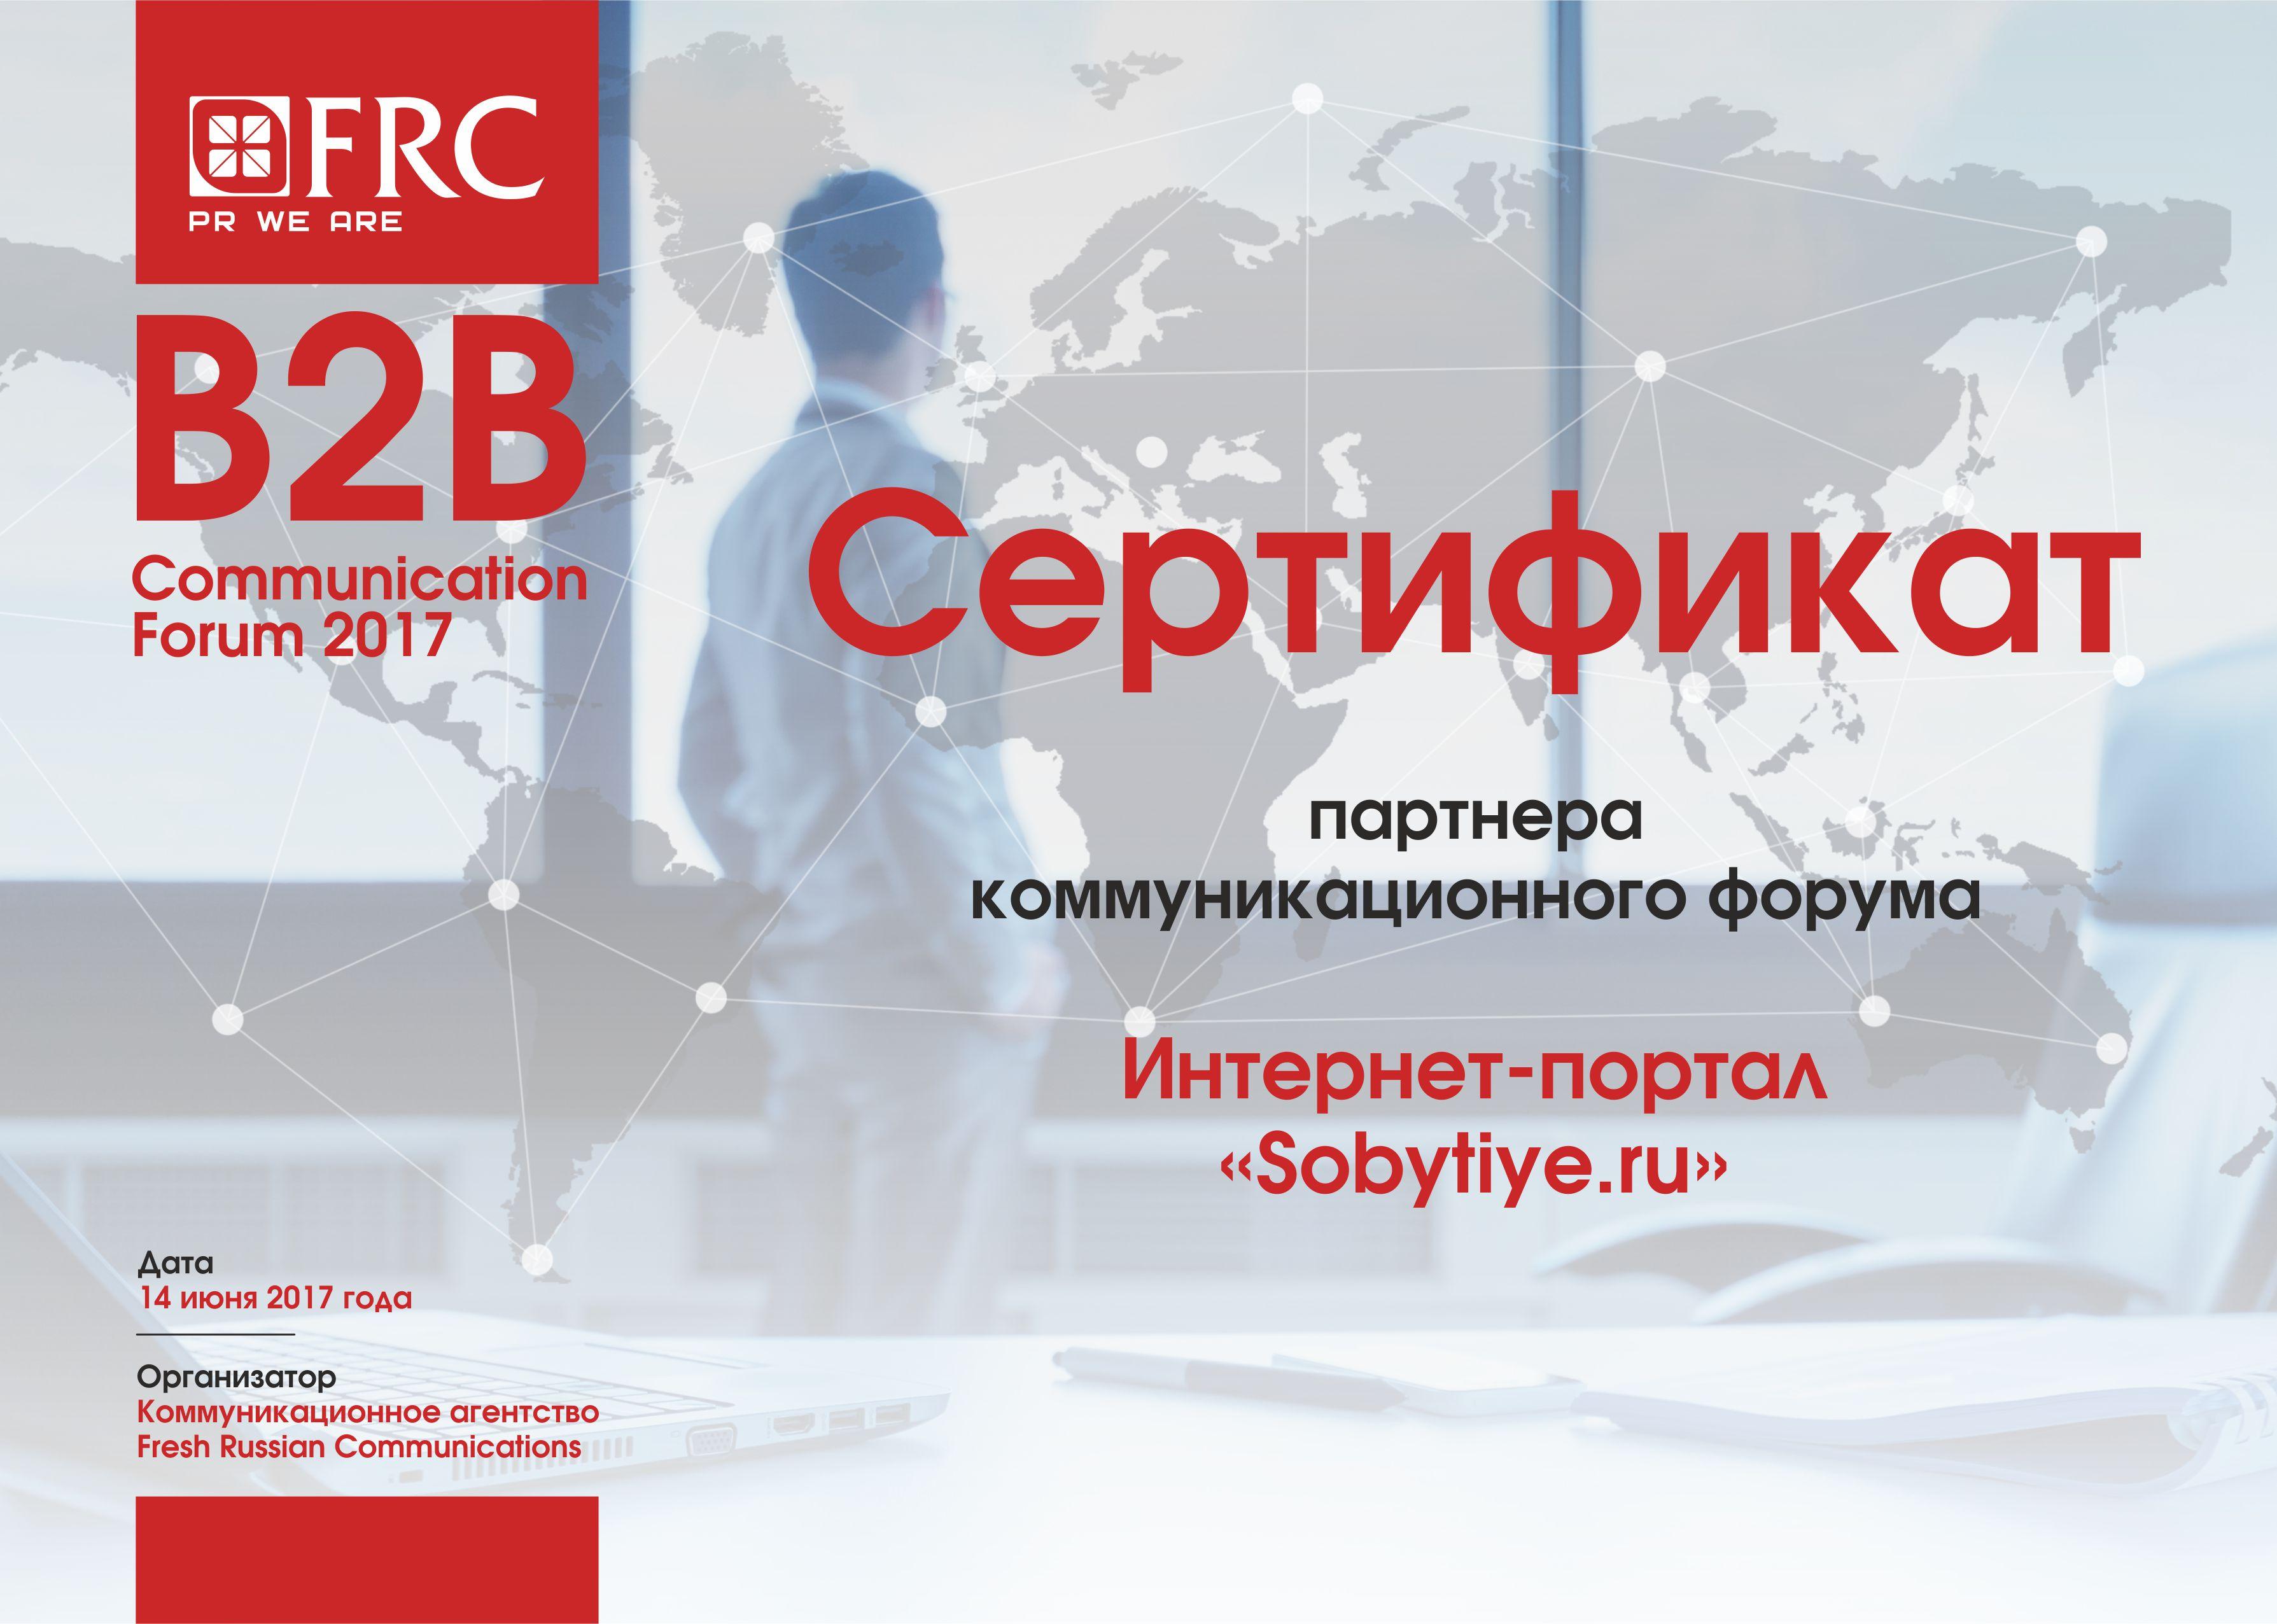 Интернет-портал Sobytiye.ru